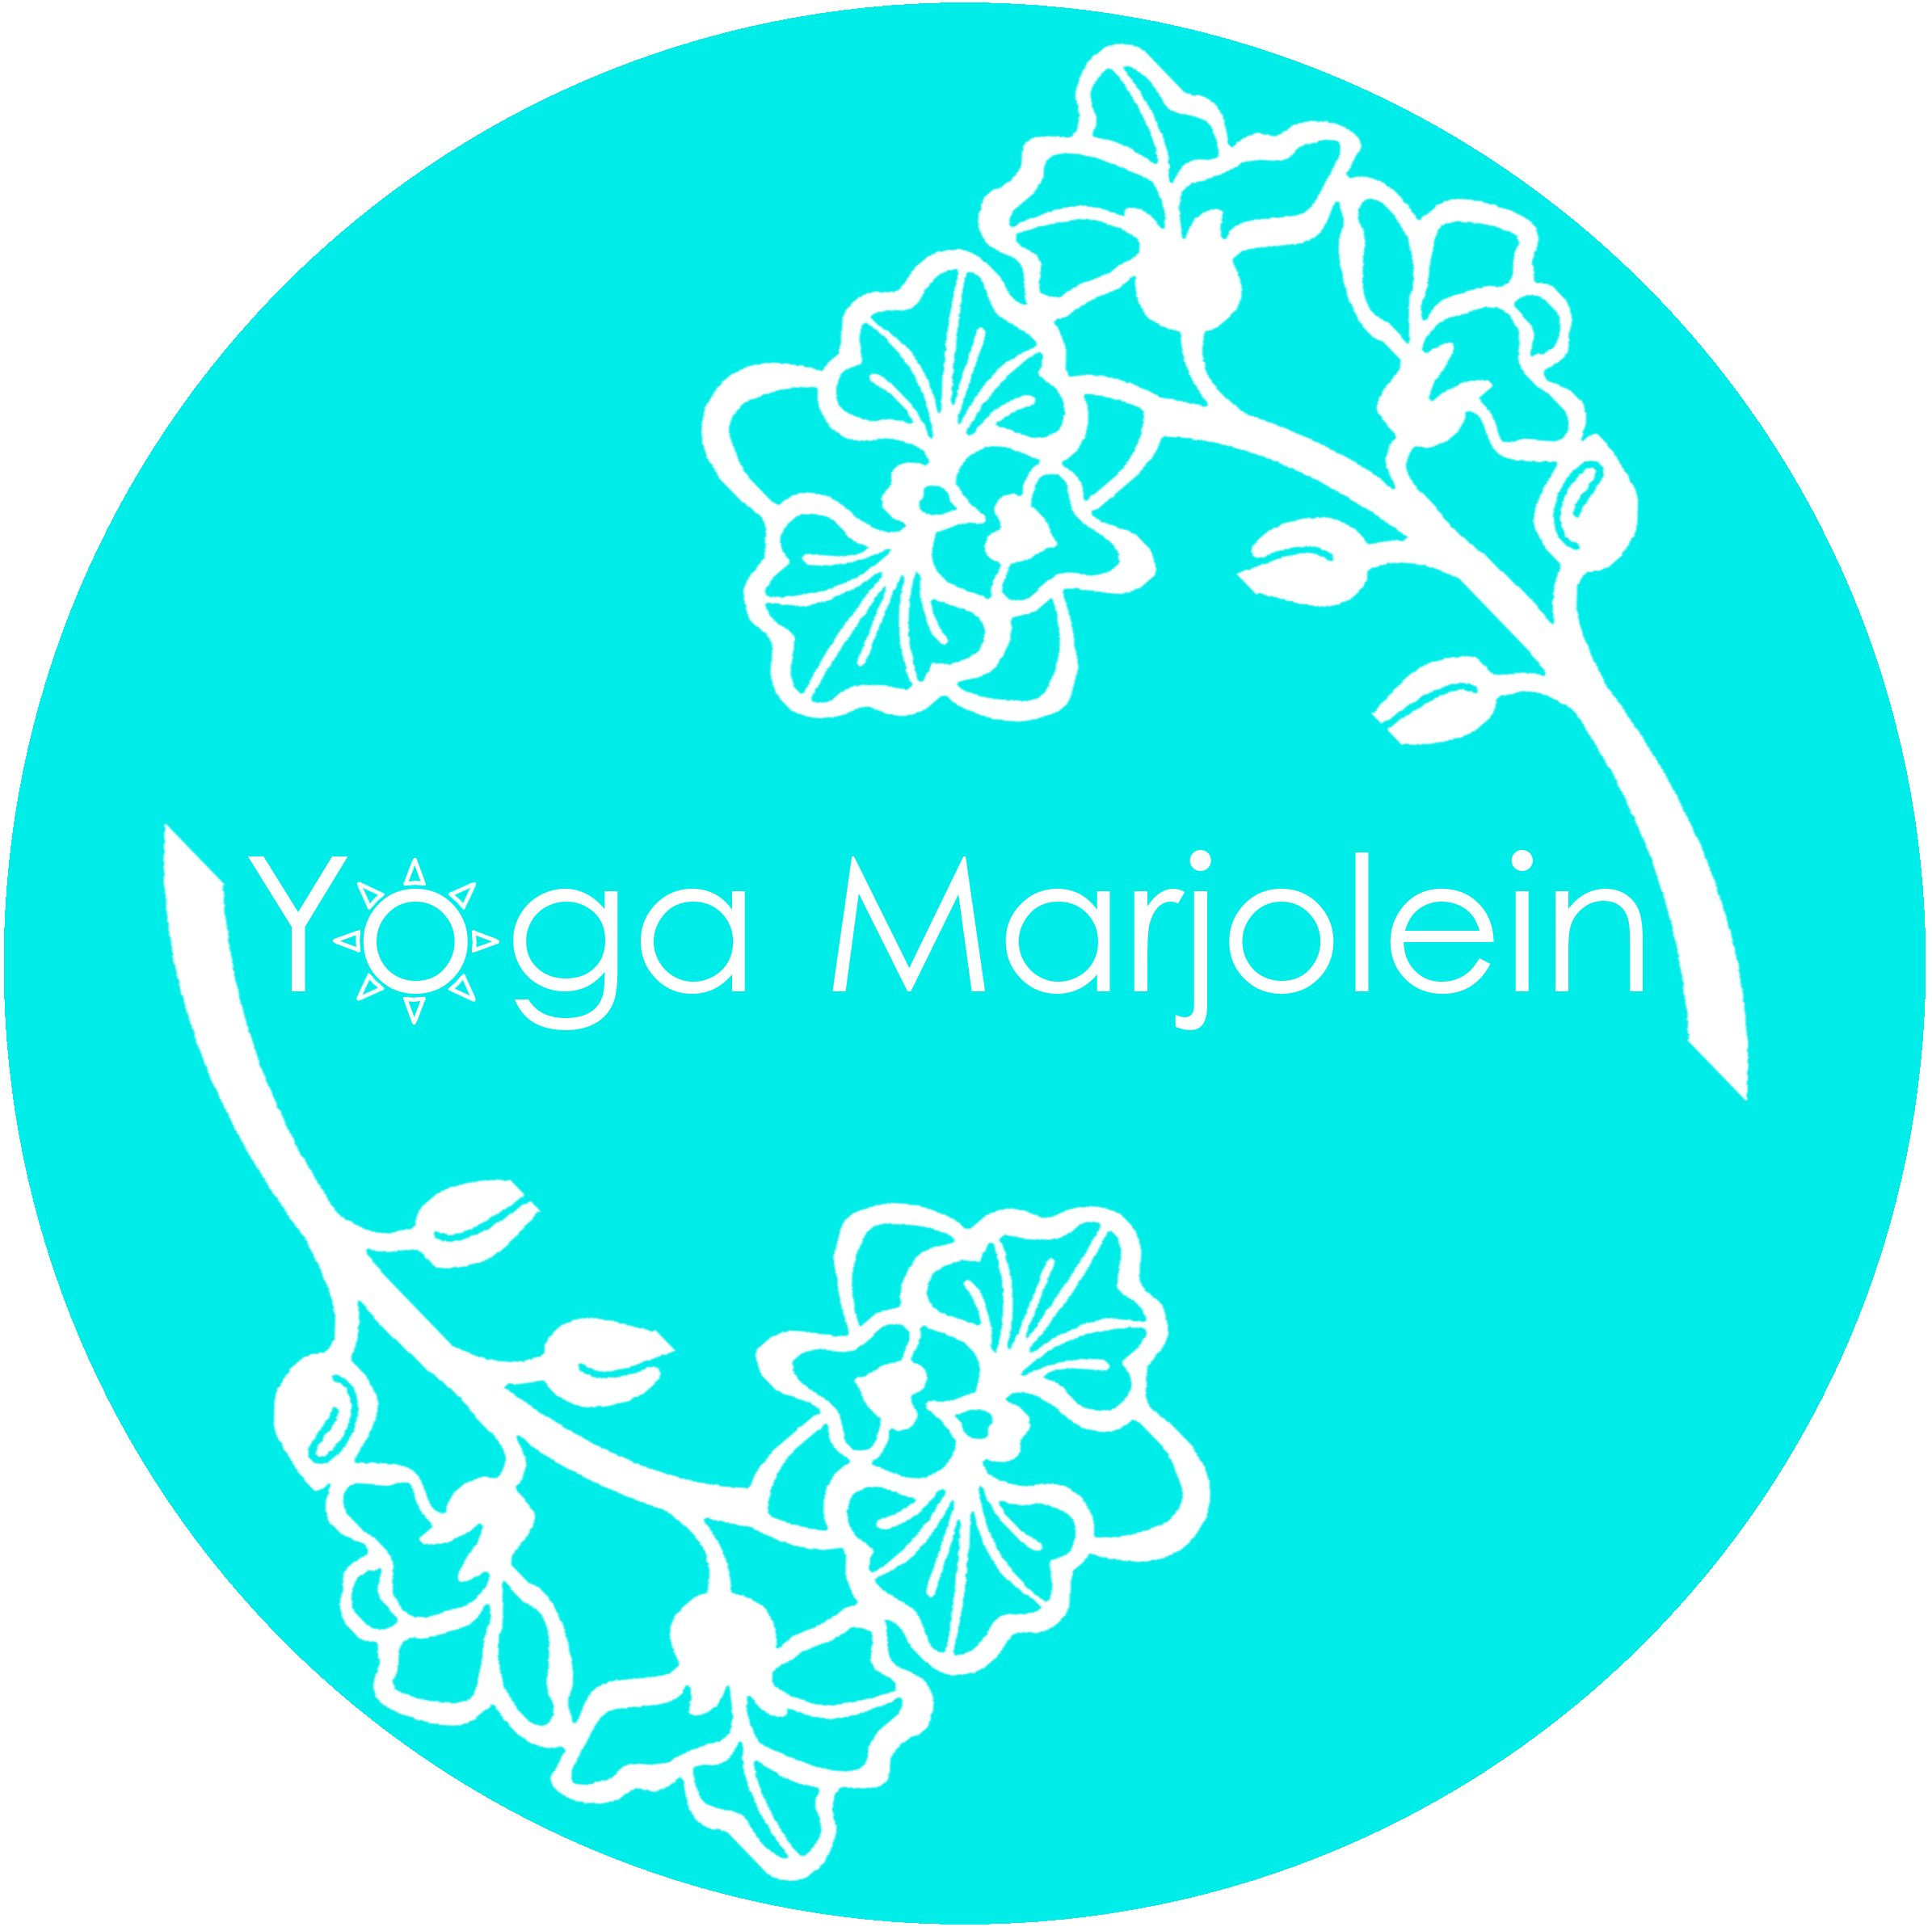 Yoga Marjolein